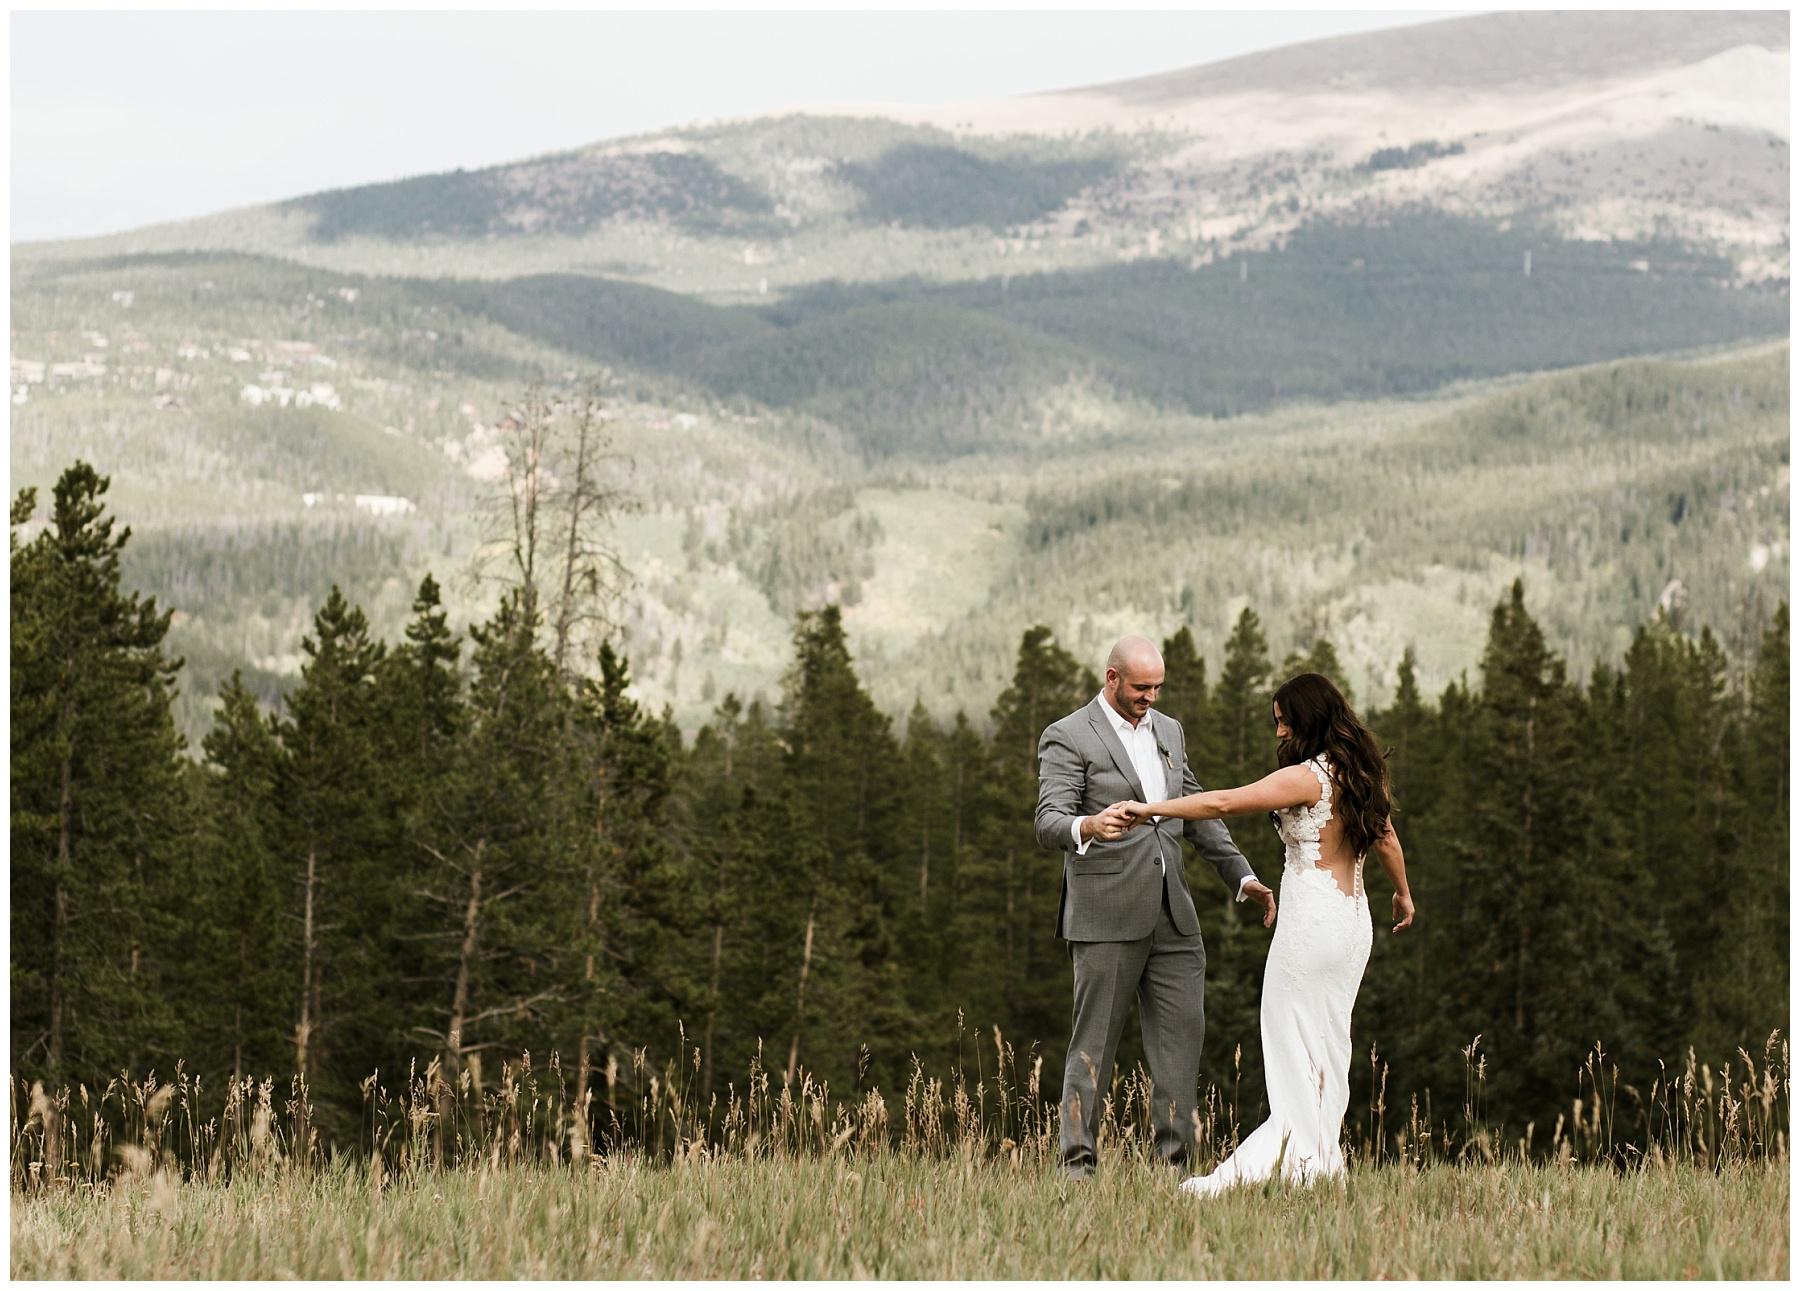 Katesalleyphotography-182_married in Breckenridge.jpg